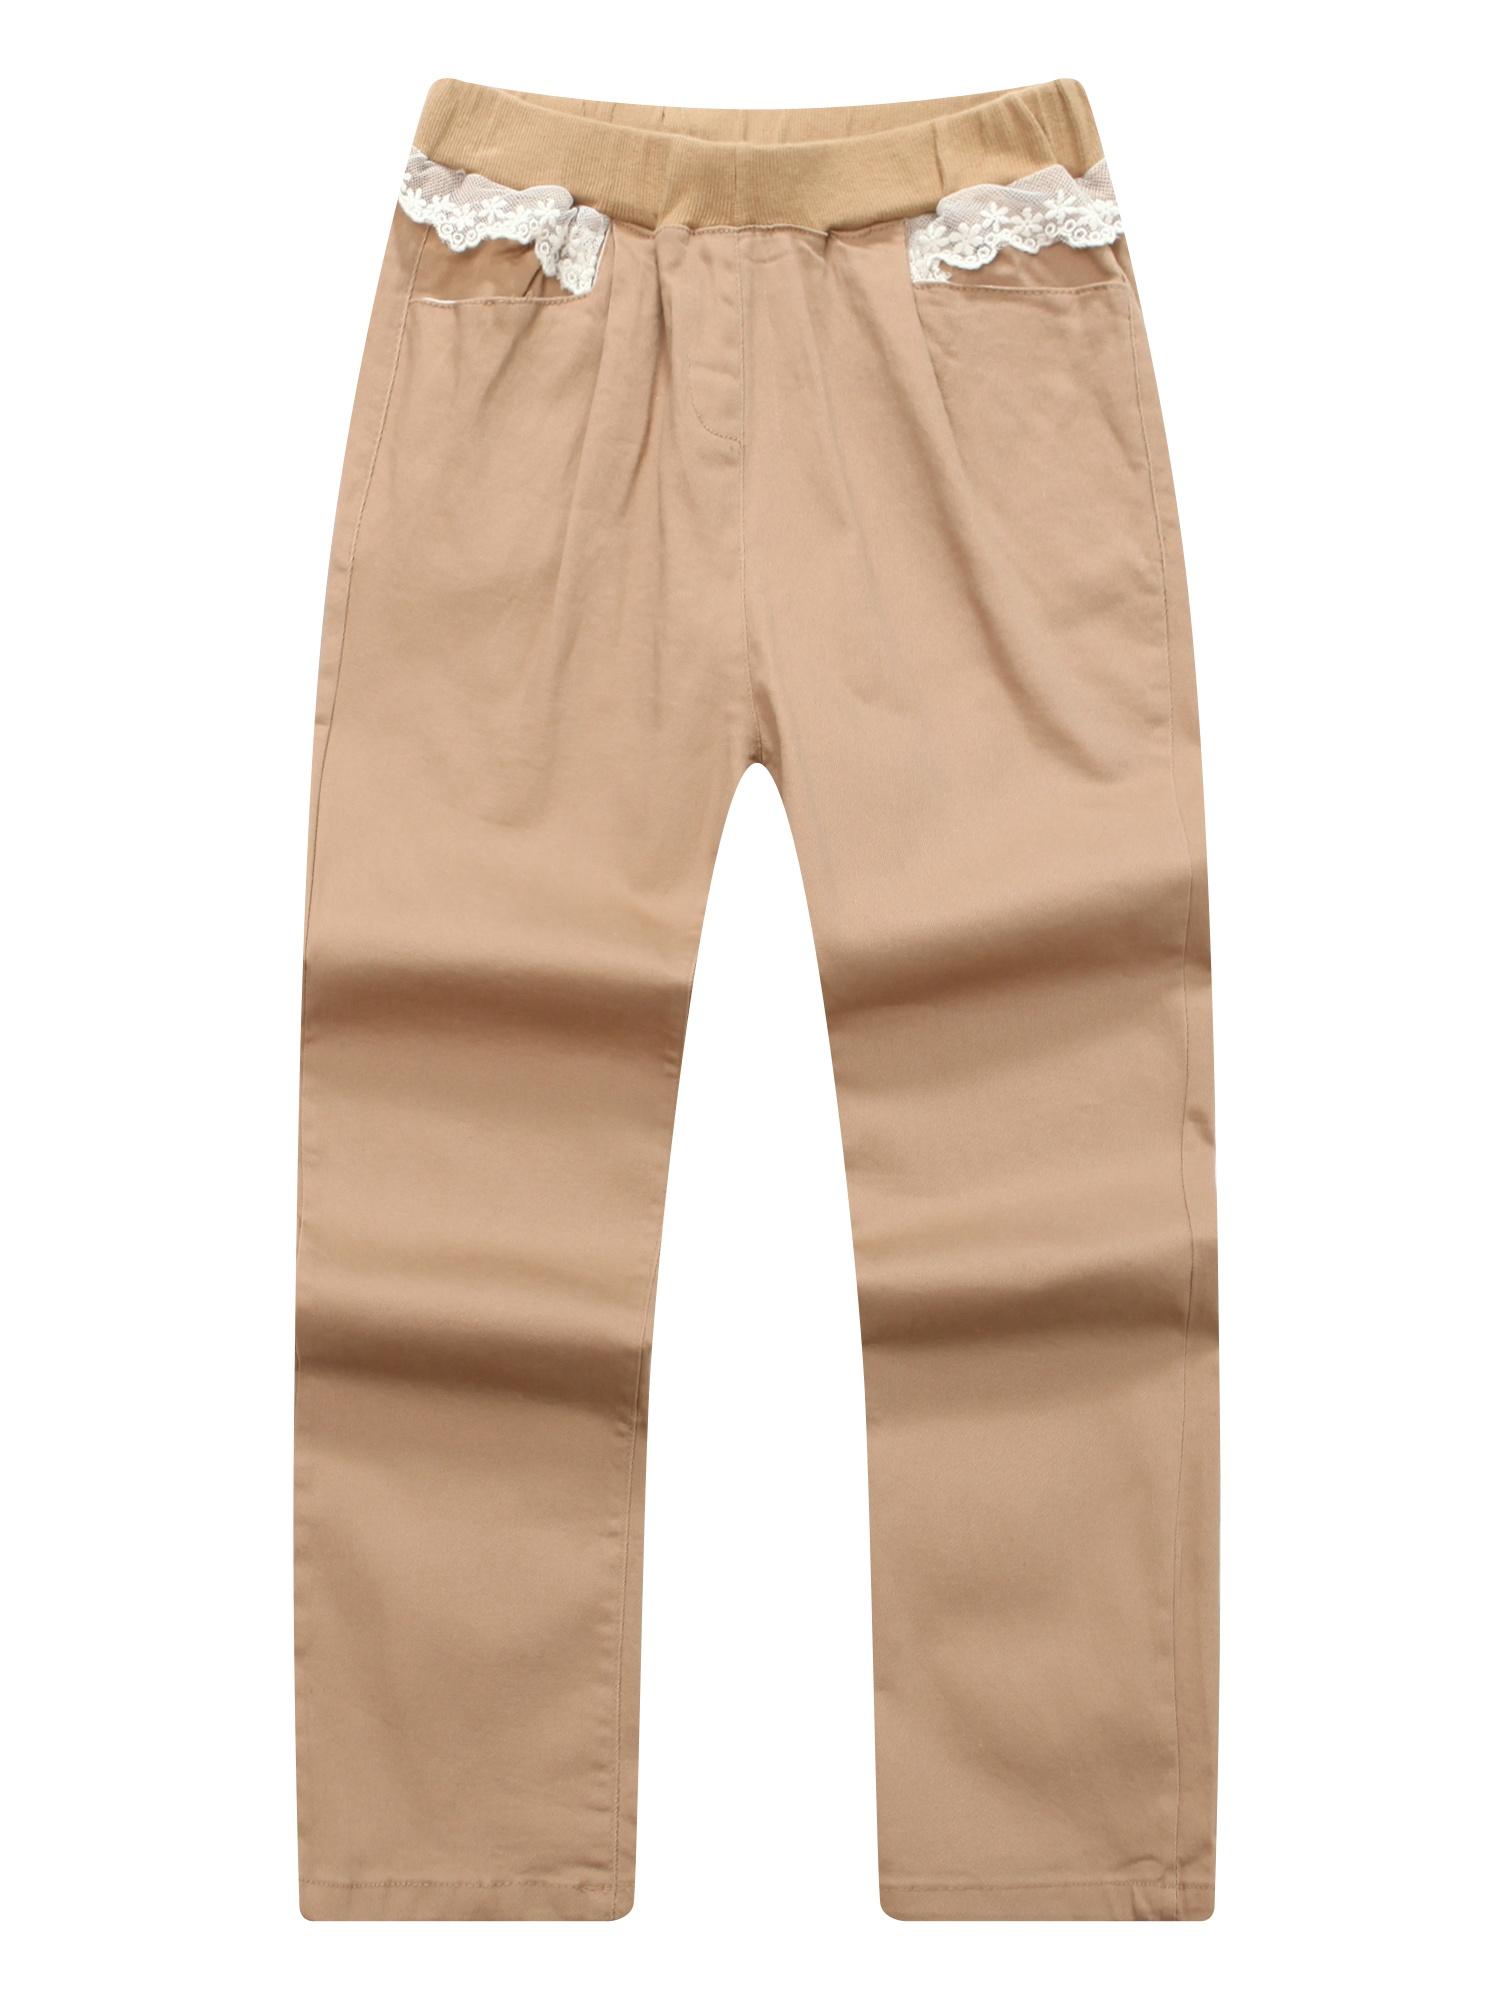 Richie House Girls' Custom fit leisure pants RH1225